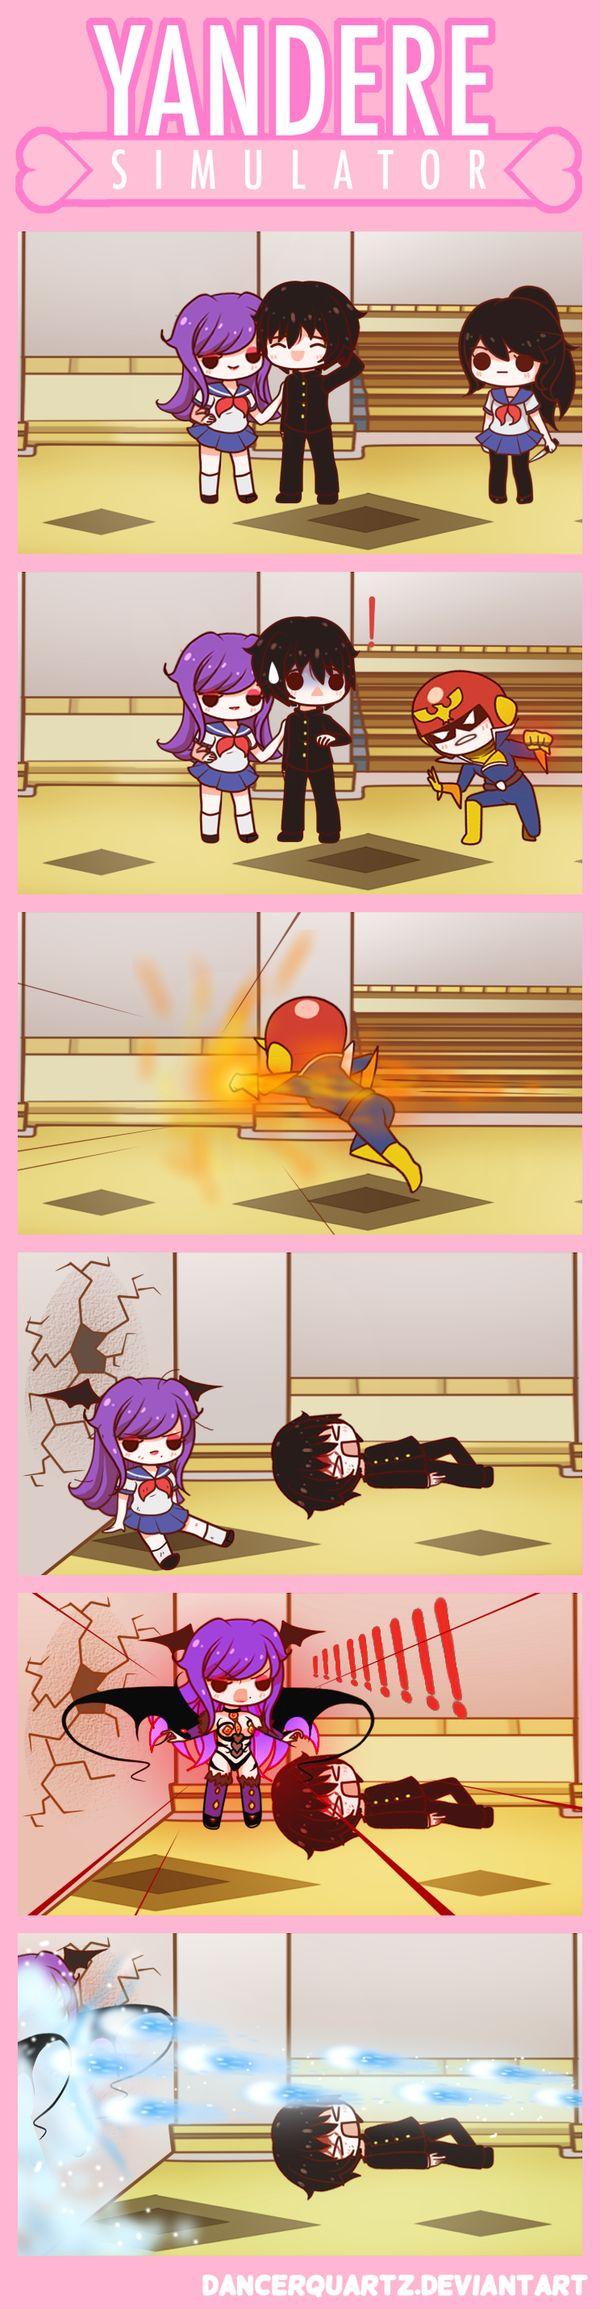 http://www.deviantart.com/art/Yandere-Comic-Bad-Senpai-627347651